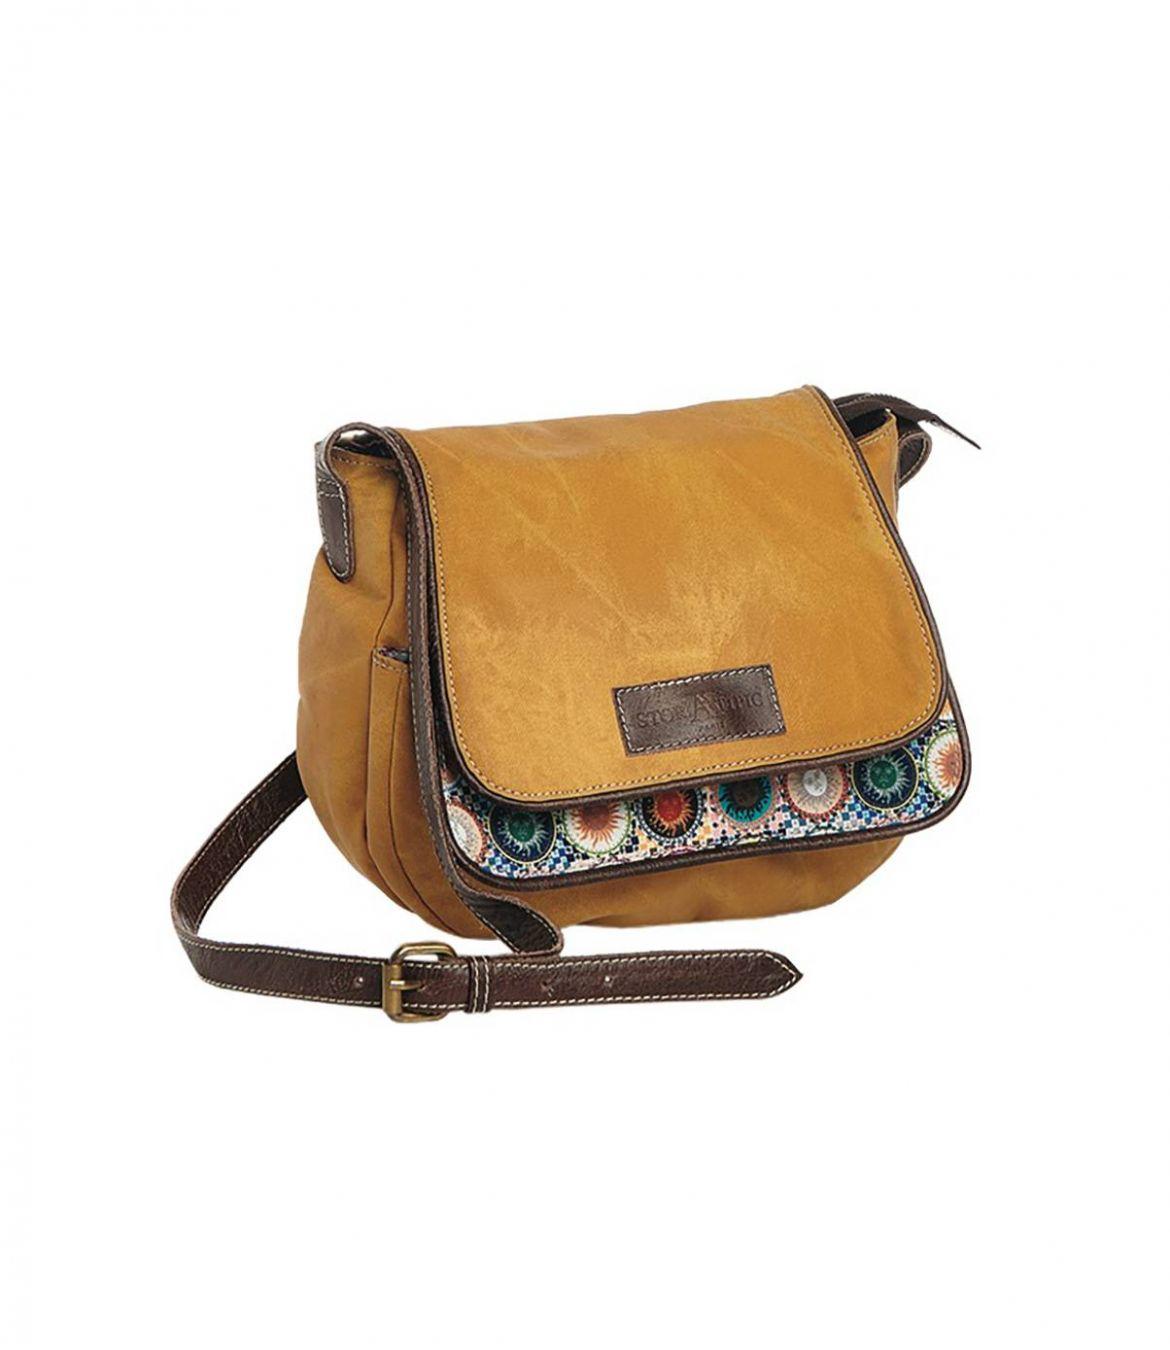 HARMONIC PU PU Bag, Subli for Women 26x24 cm Storiatipic - 3